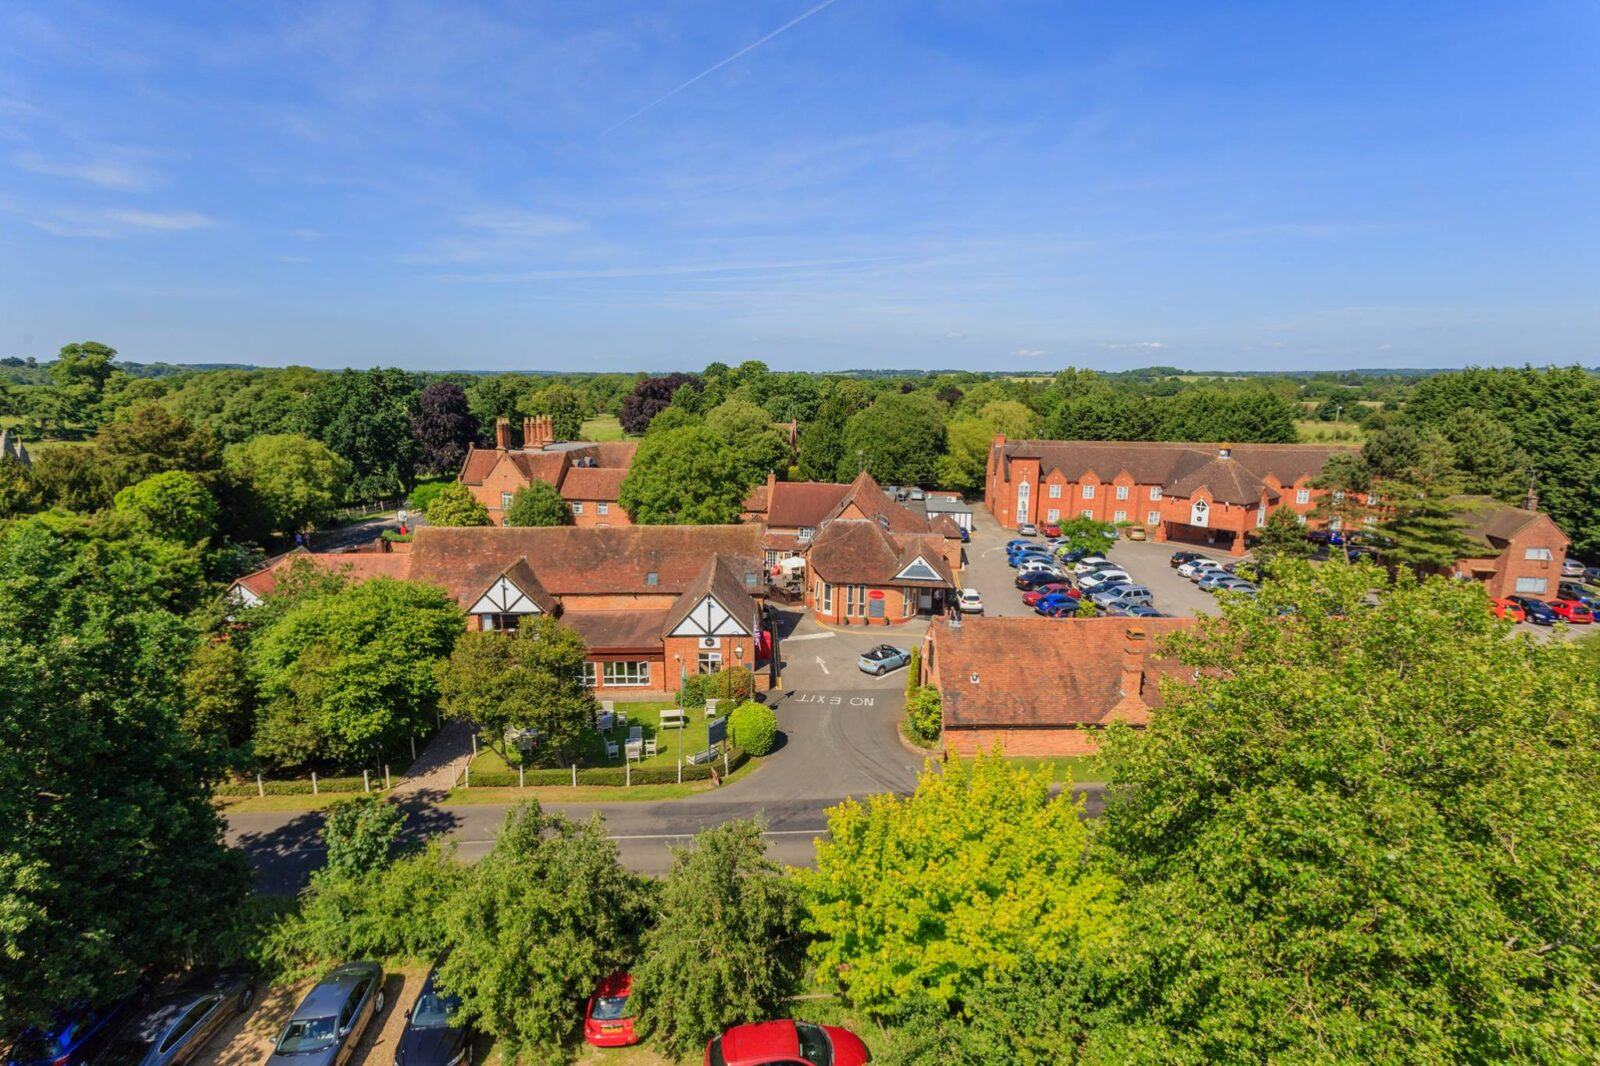 The Charlecote Pheasant hotel Stratford-upon-Avon